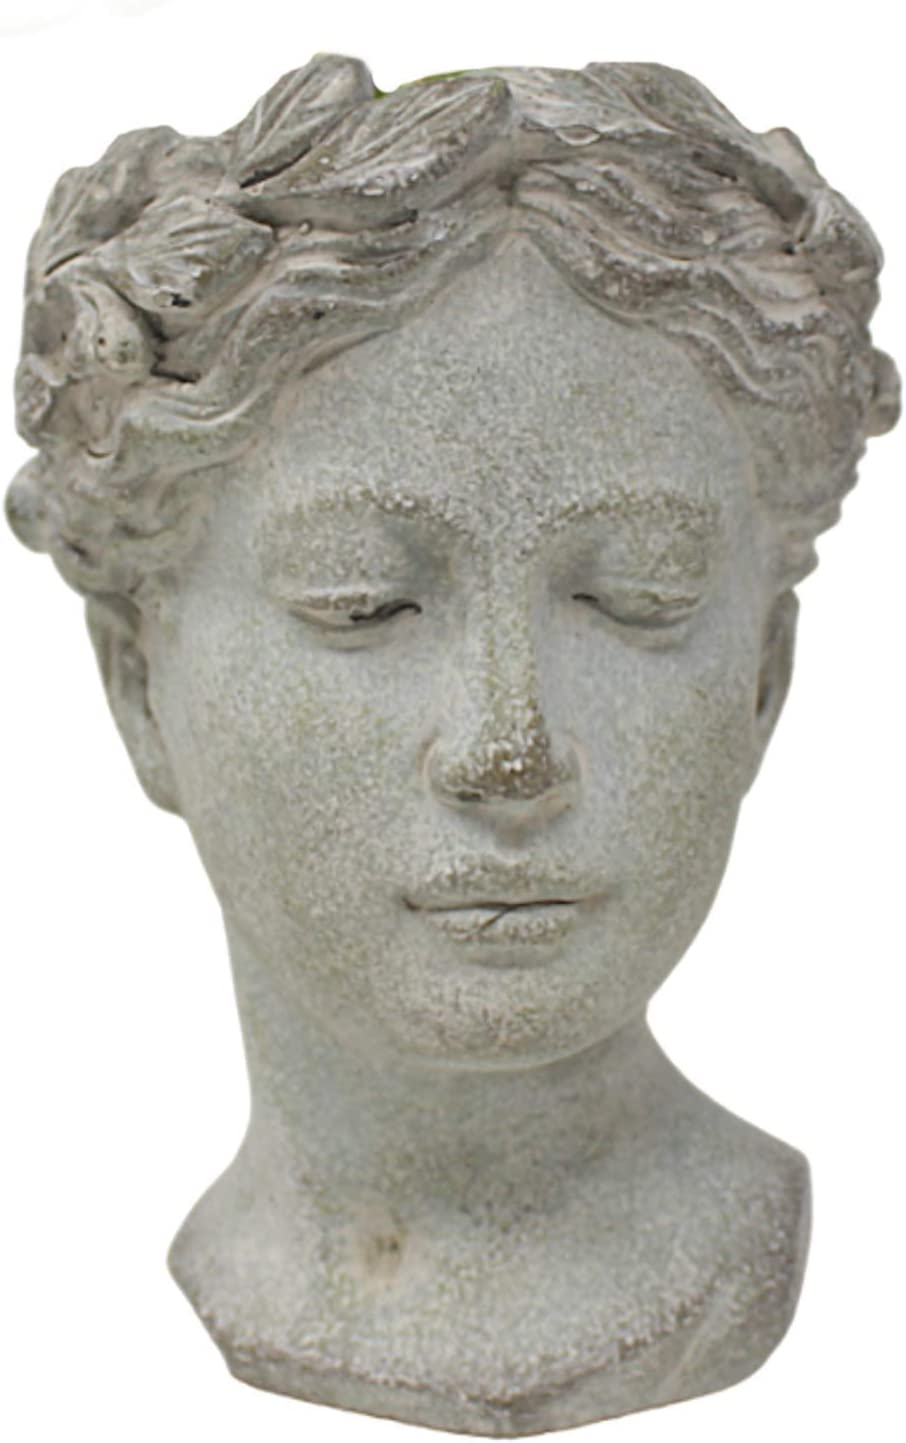 Concrete Grecian Goddess Head Succelent Planter with Distressed Finish Classical Garden Decor , 8 1/2 Inch